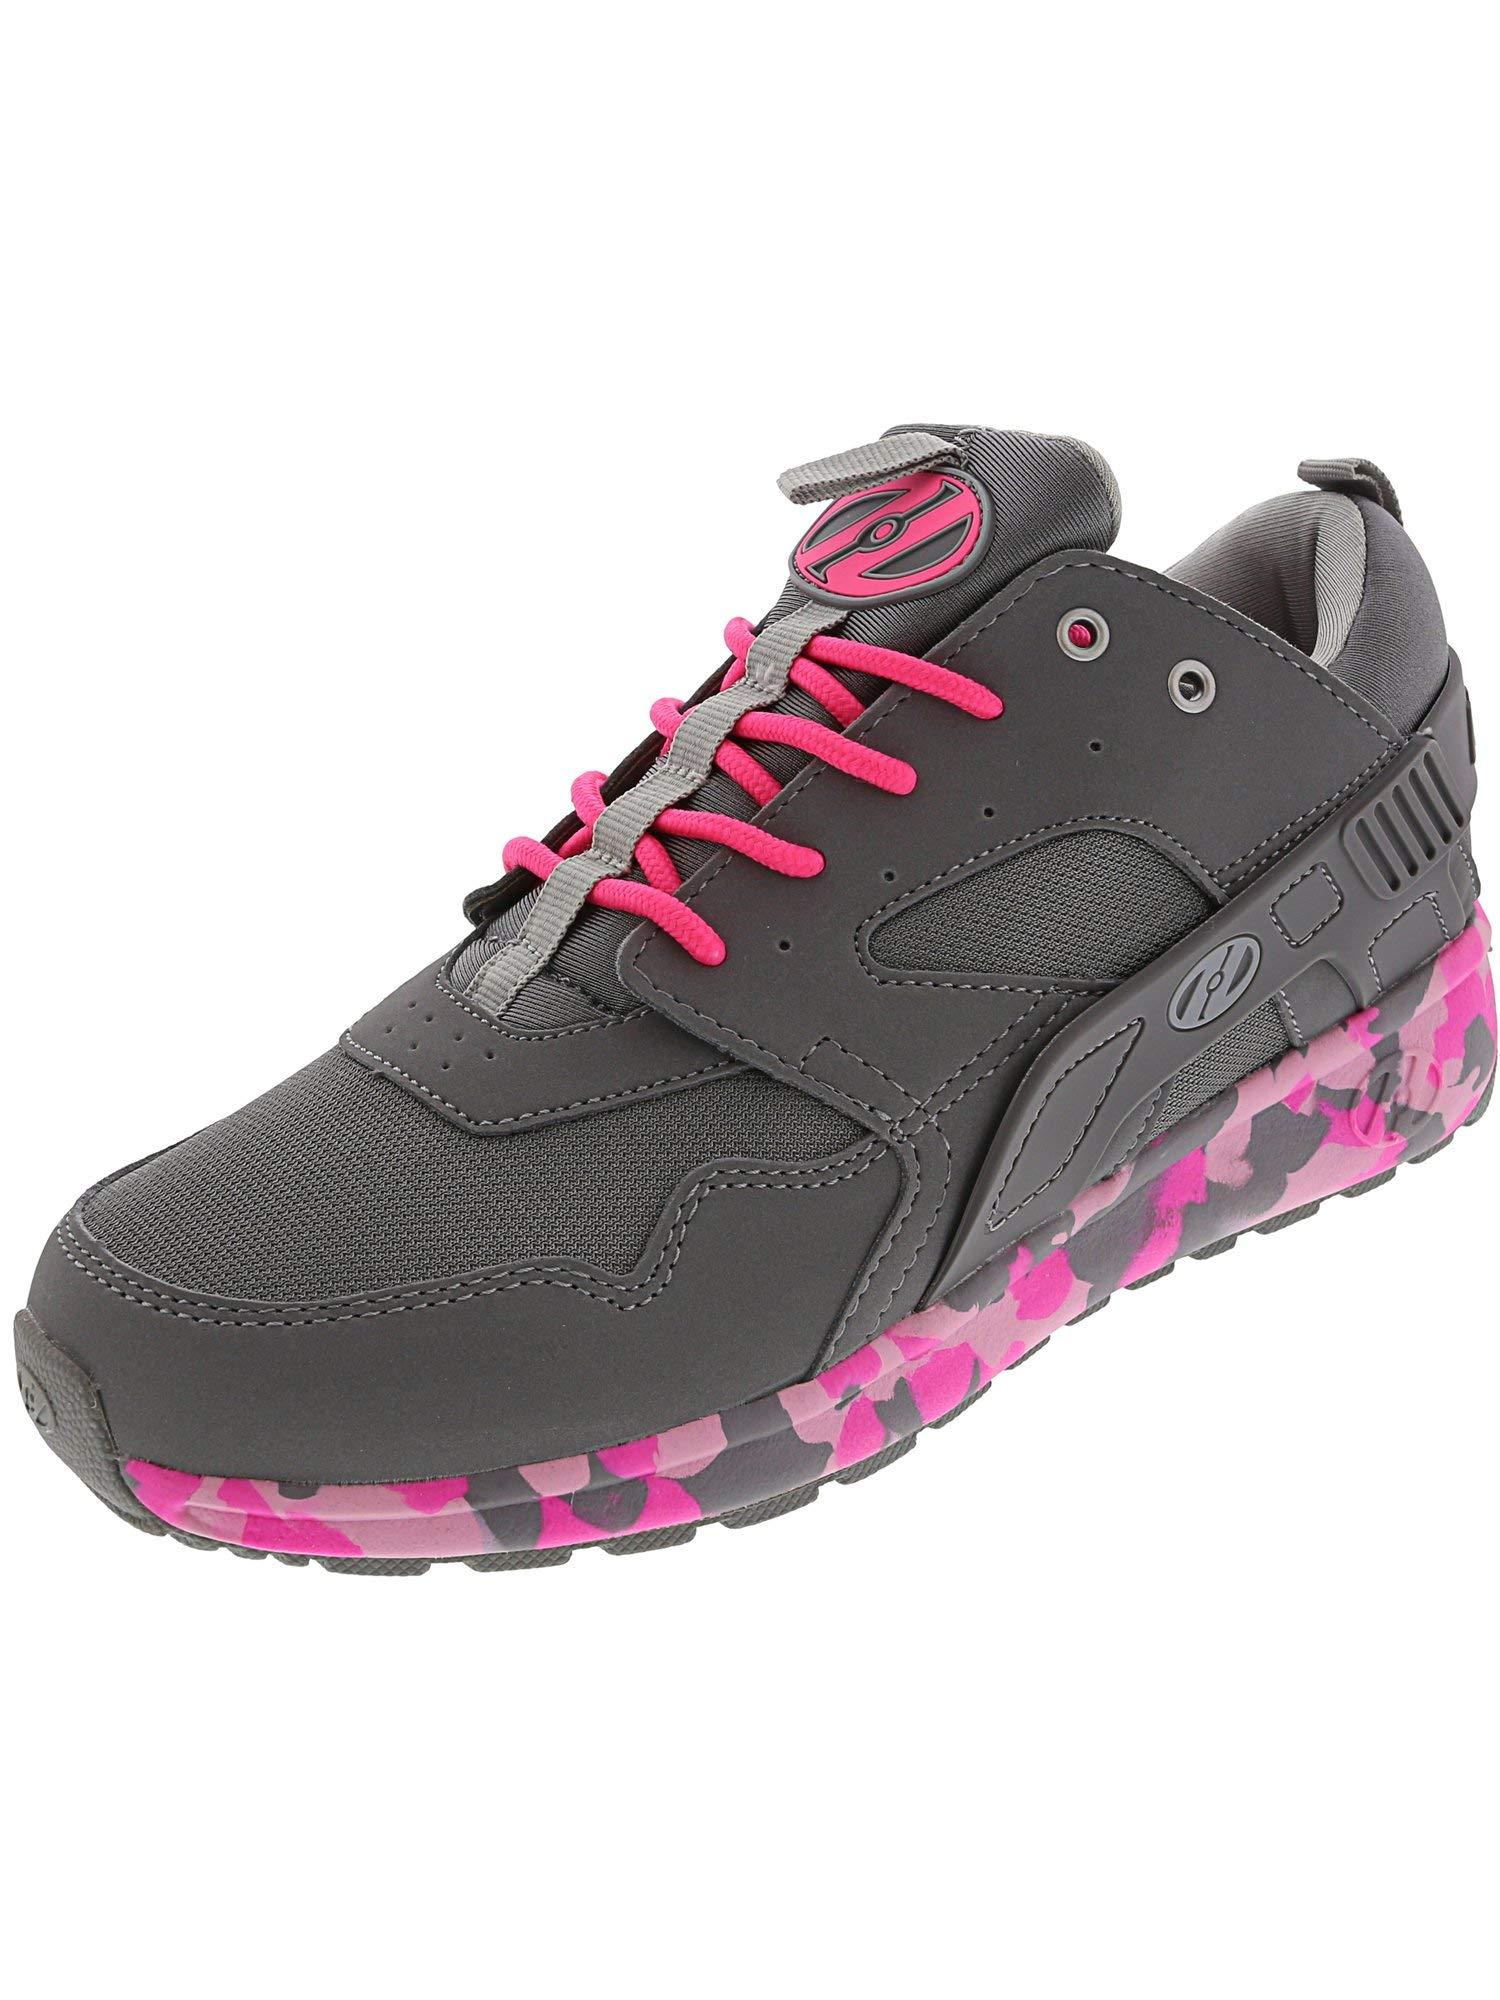 Heelys HE100098H Kid's Force Sneakers, Grey/Pink Confetti - 5